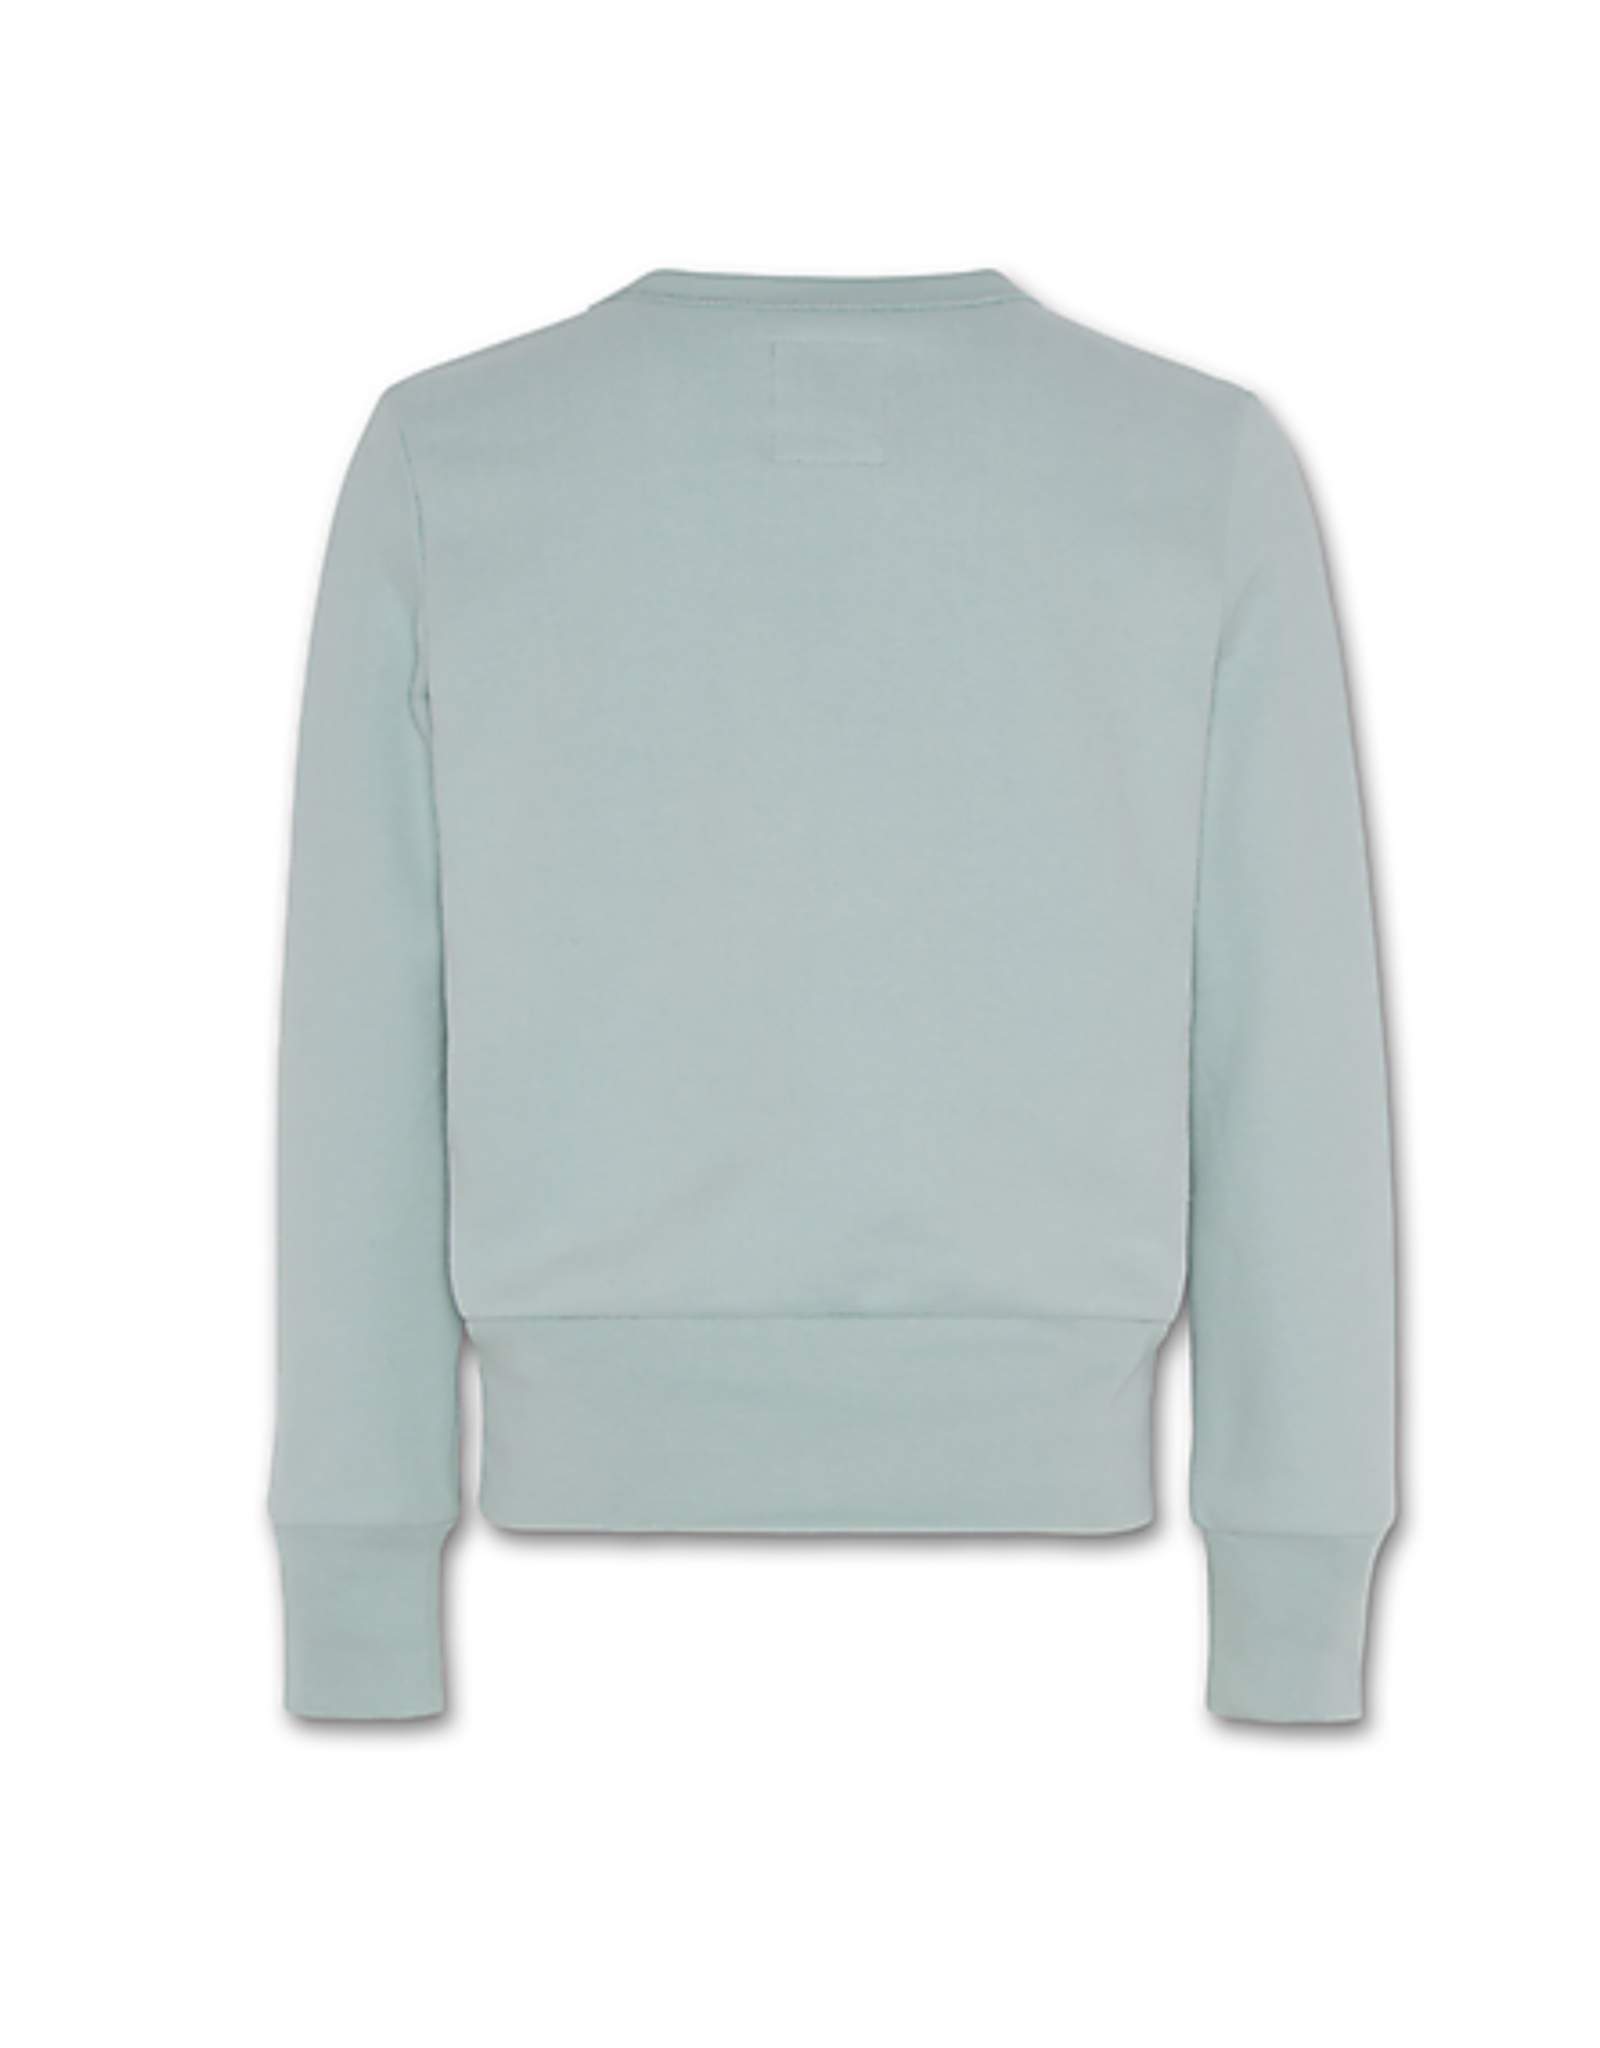 A076 c-neck sweater dance